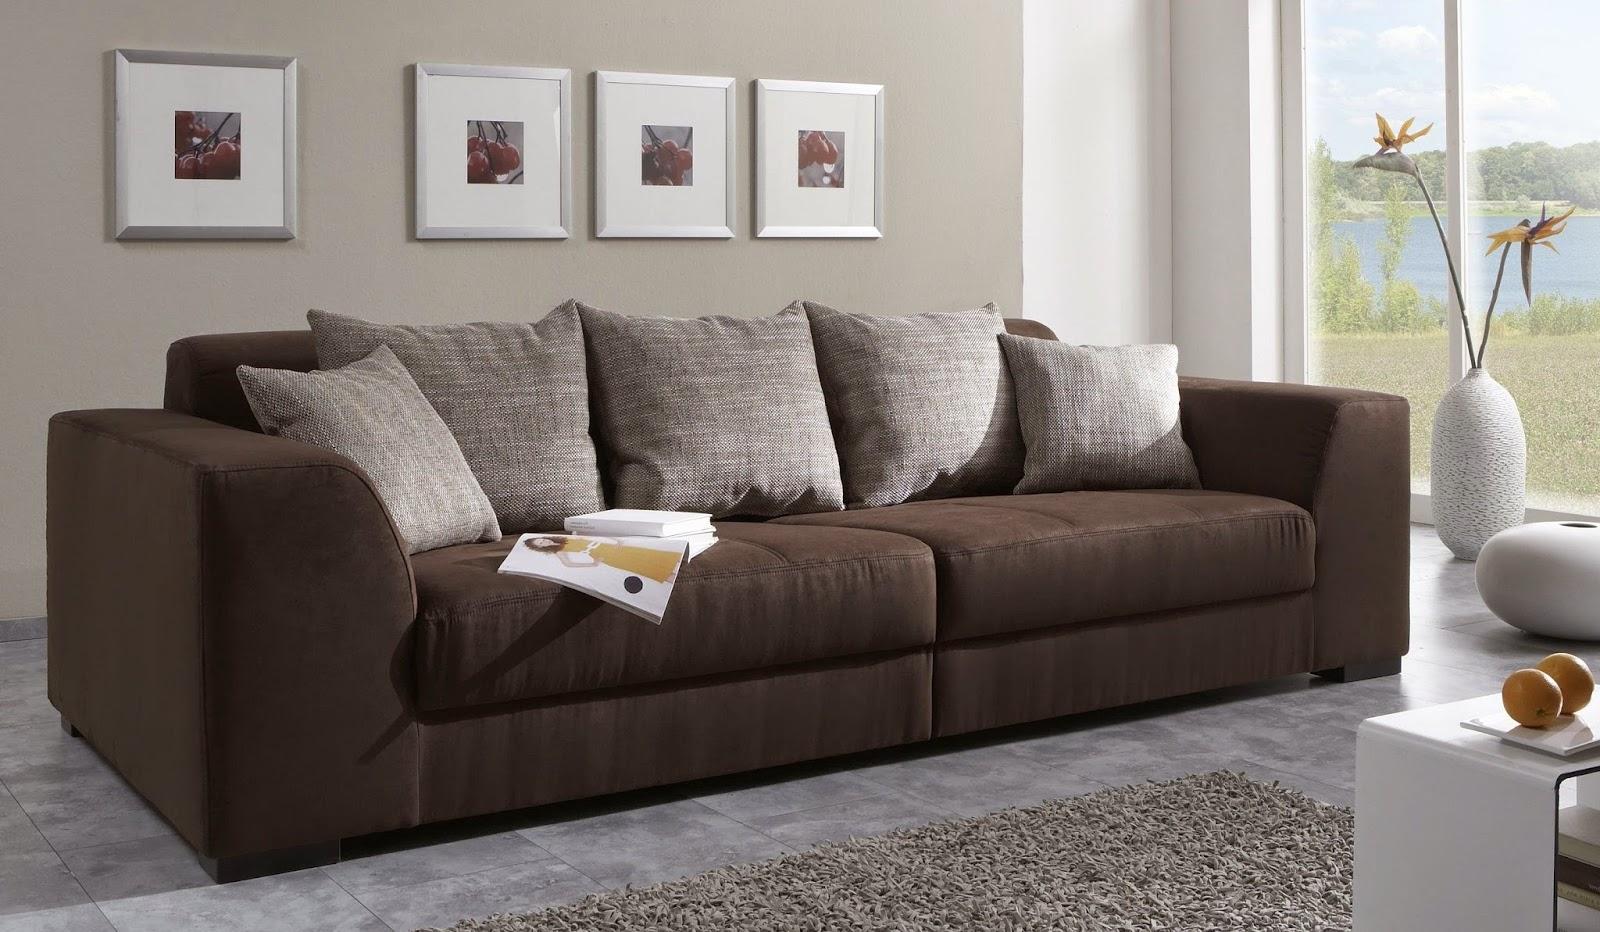 Cara memilh sofa untuk ruangan